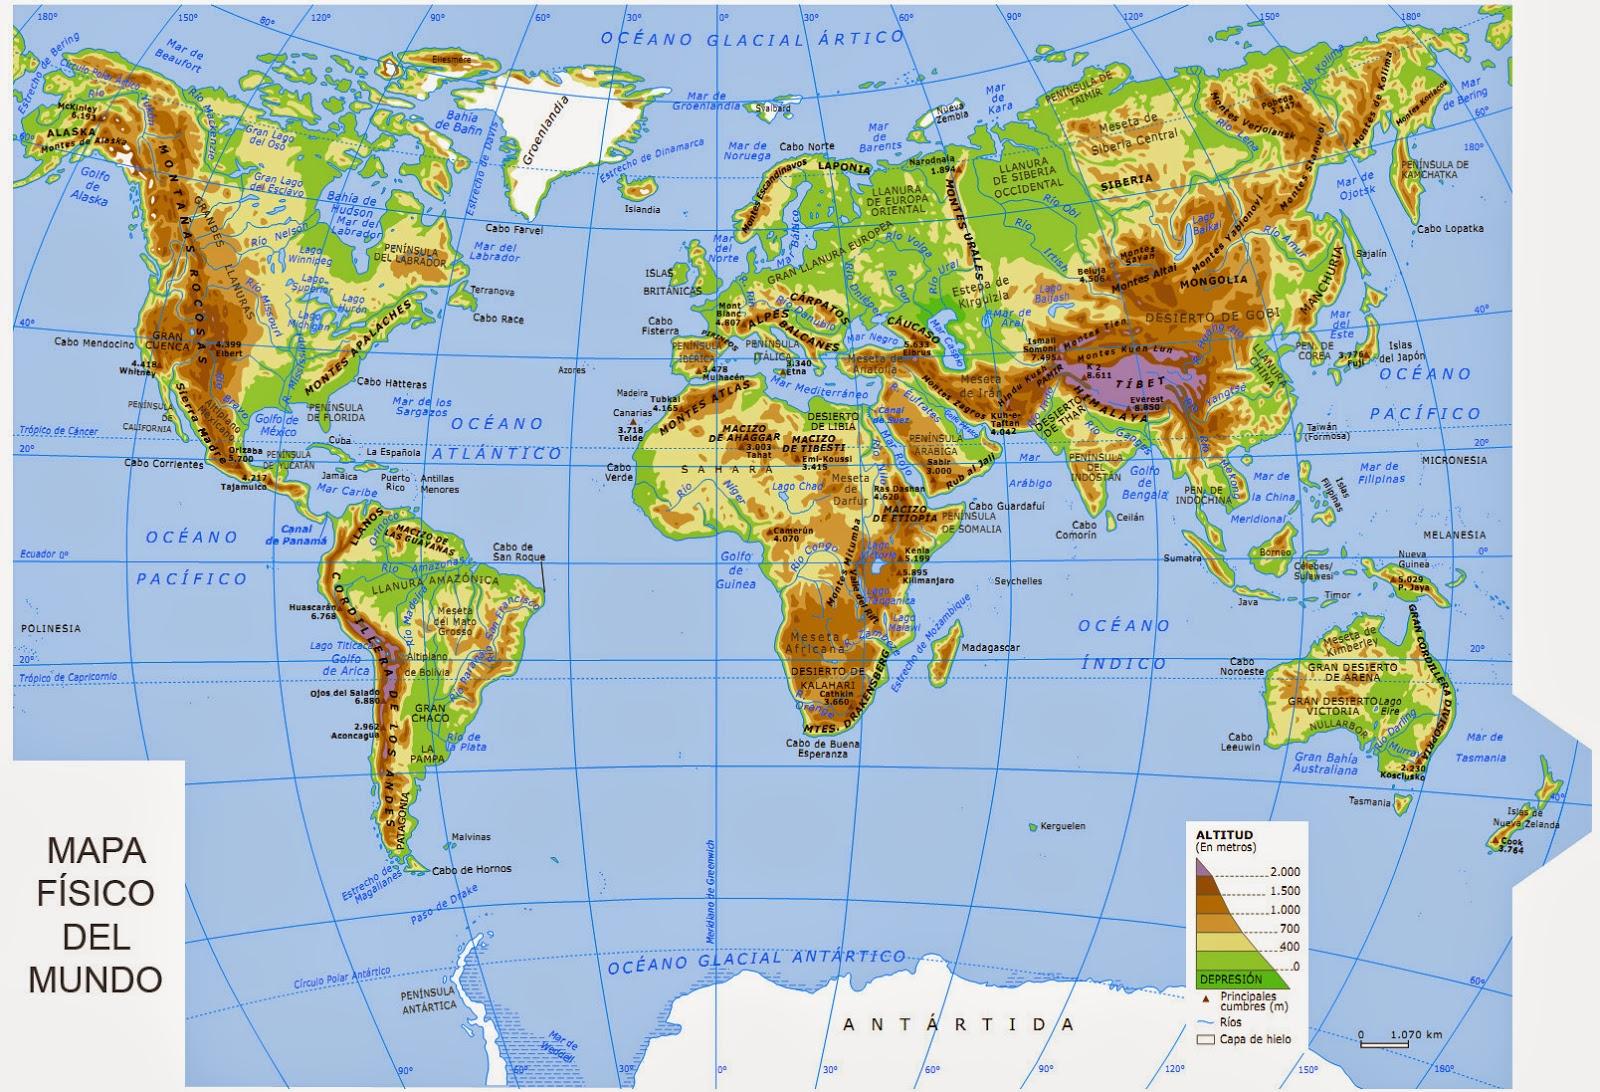 mapa%252525252Bmundo%252525252Bfisico.jpg